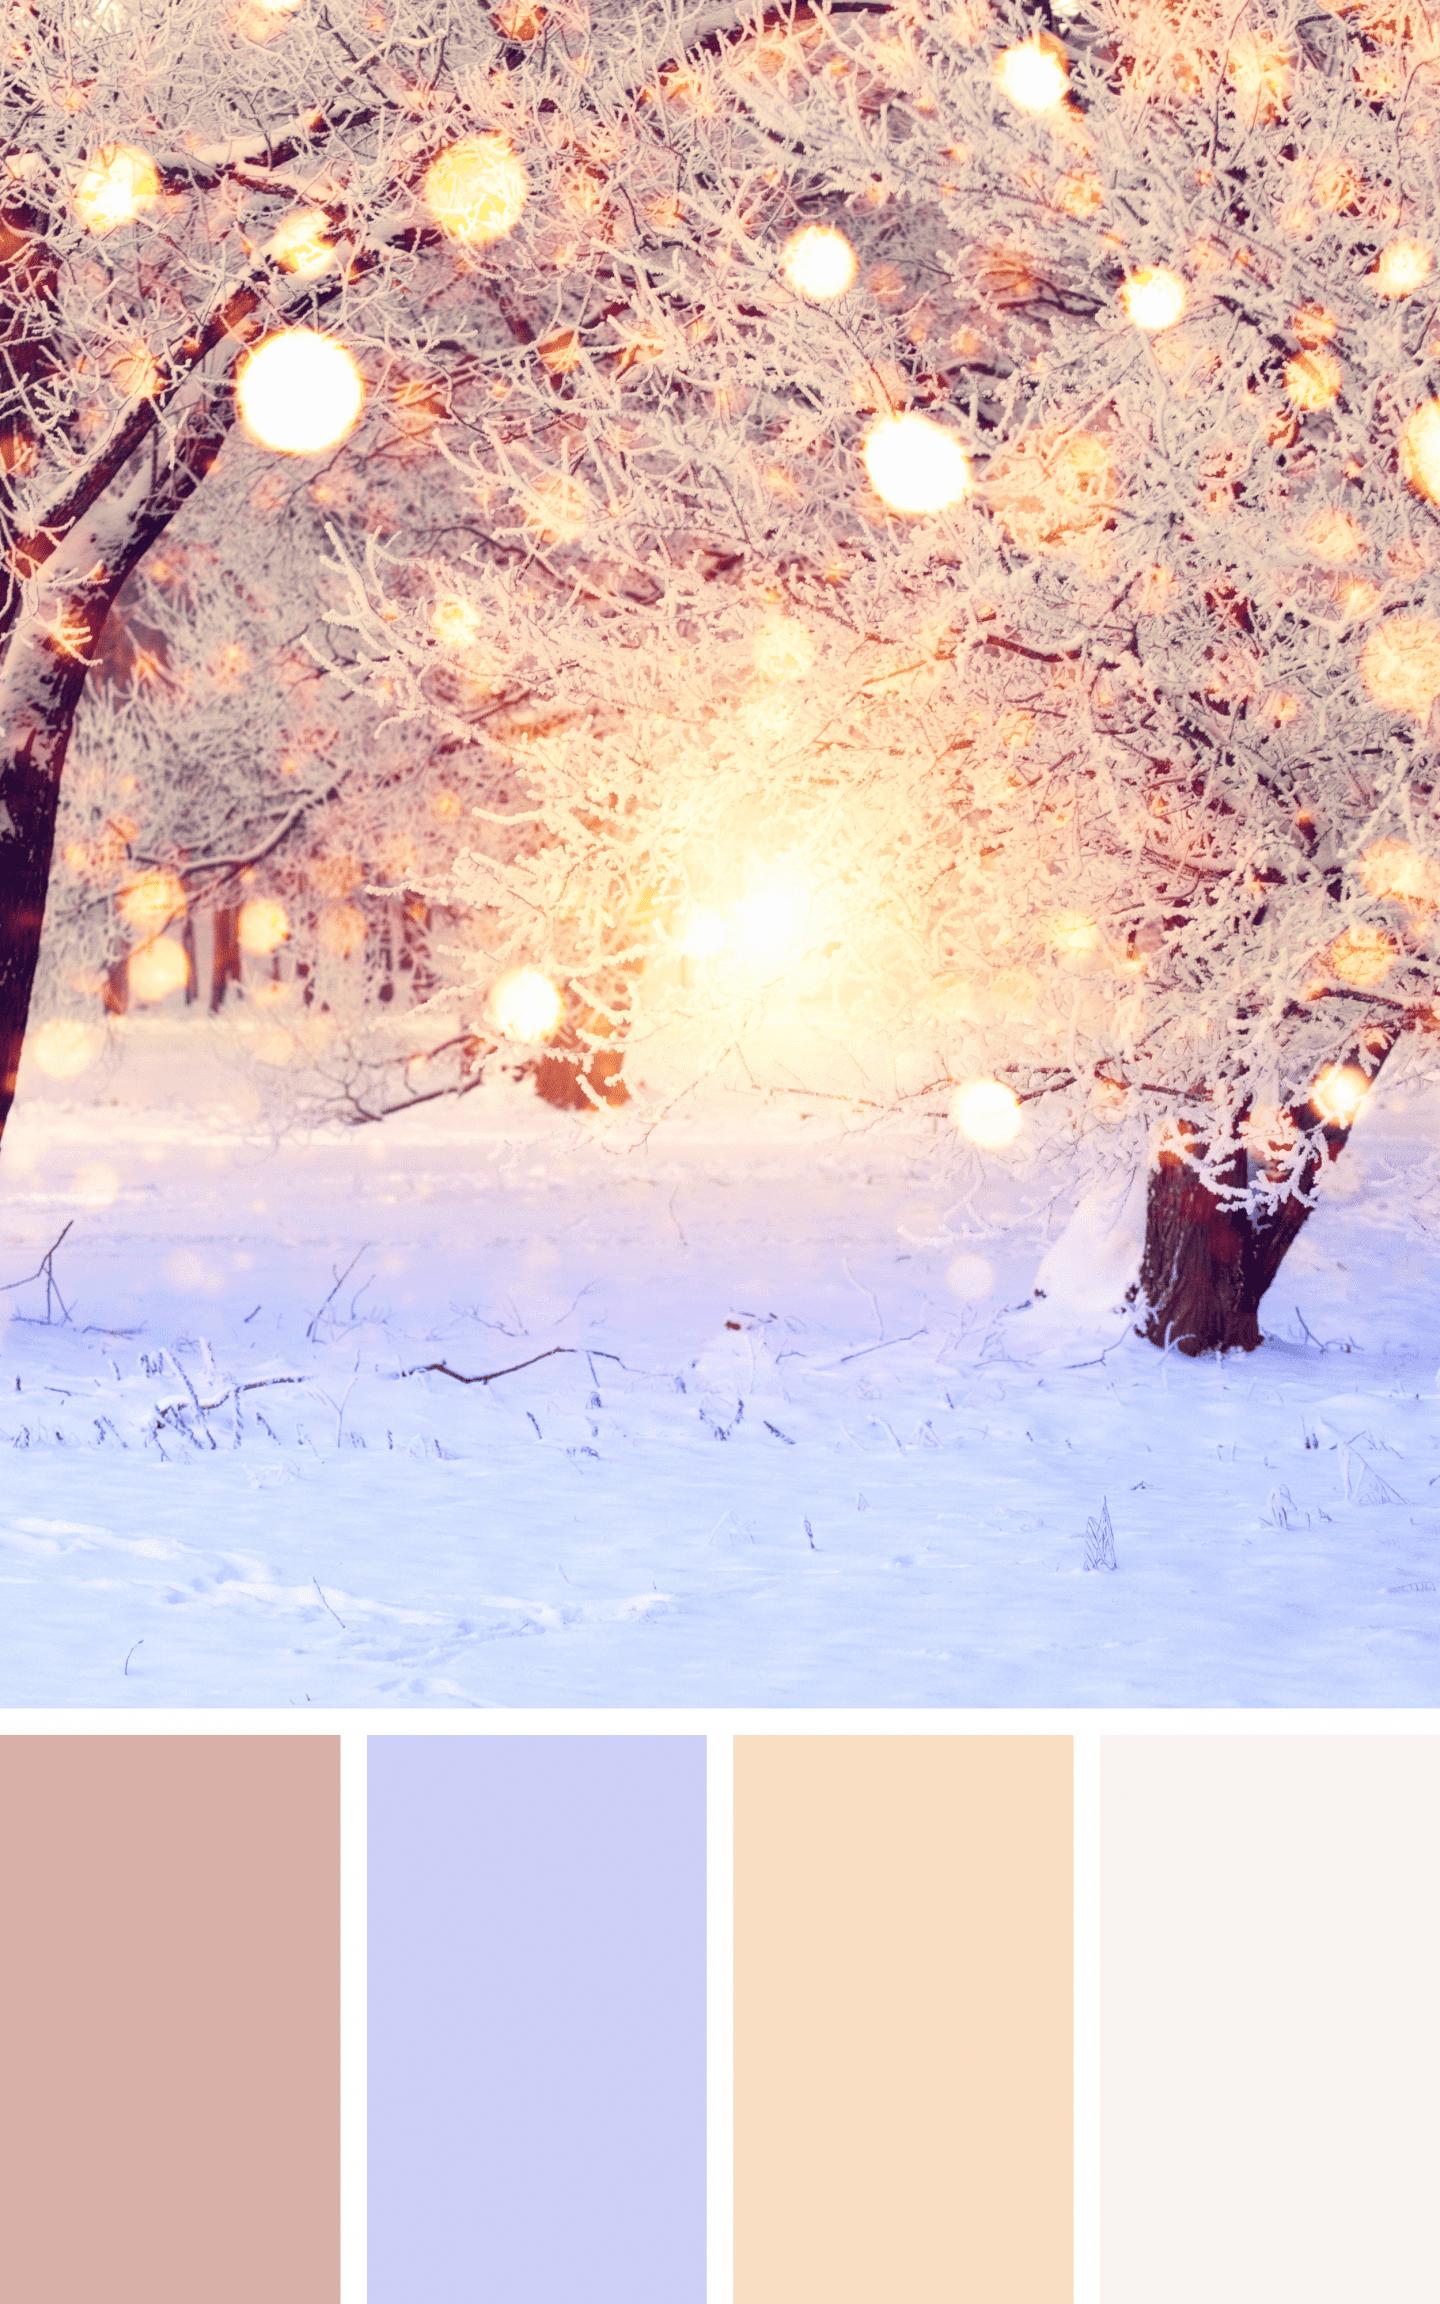 Christmas Aesthetic - Winter Wonderland- Good Life of a Housewife